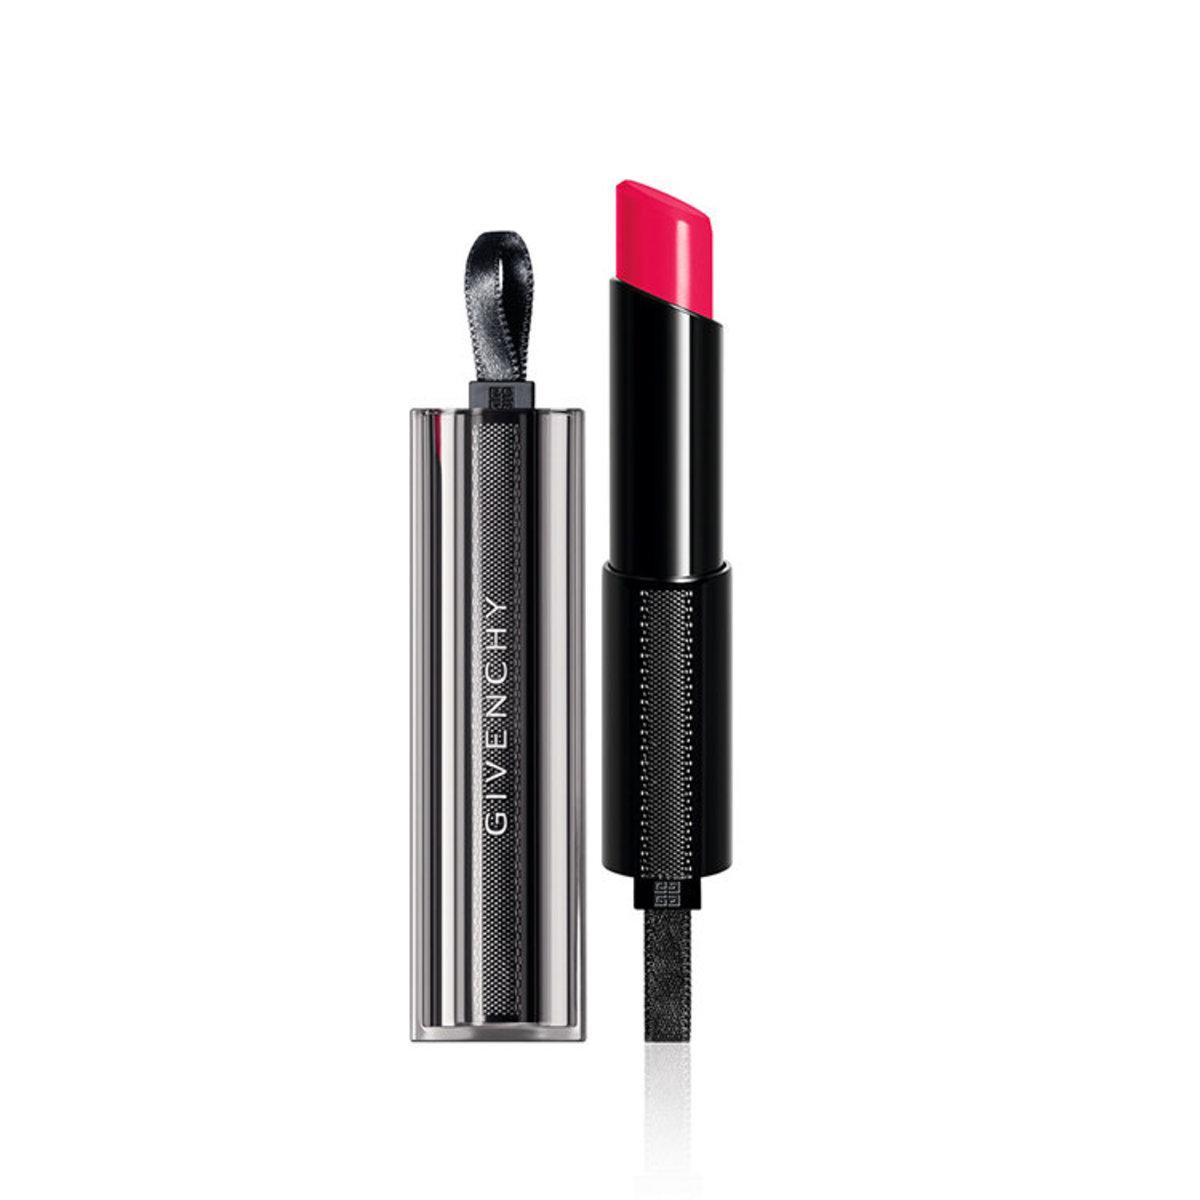 Givenchy -Rouge Interdit Vinyl lipstick N07 - Fuchsia Illicite 3.3g  [Parallel Import] (3274872306912)